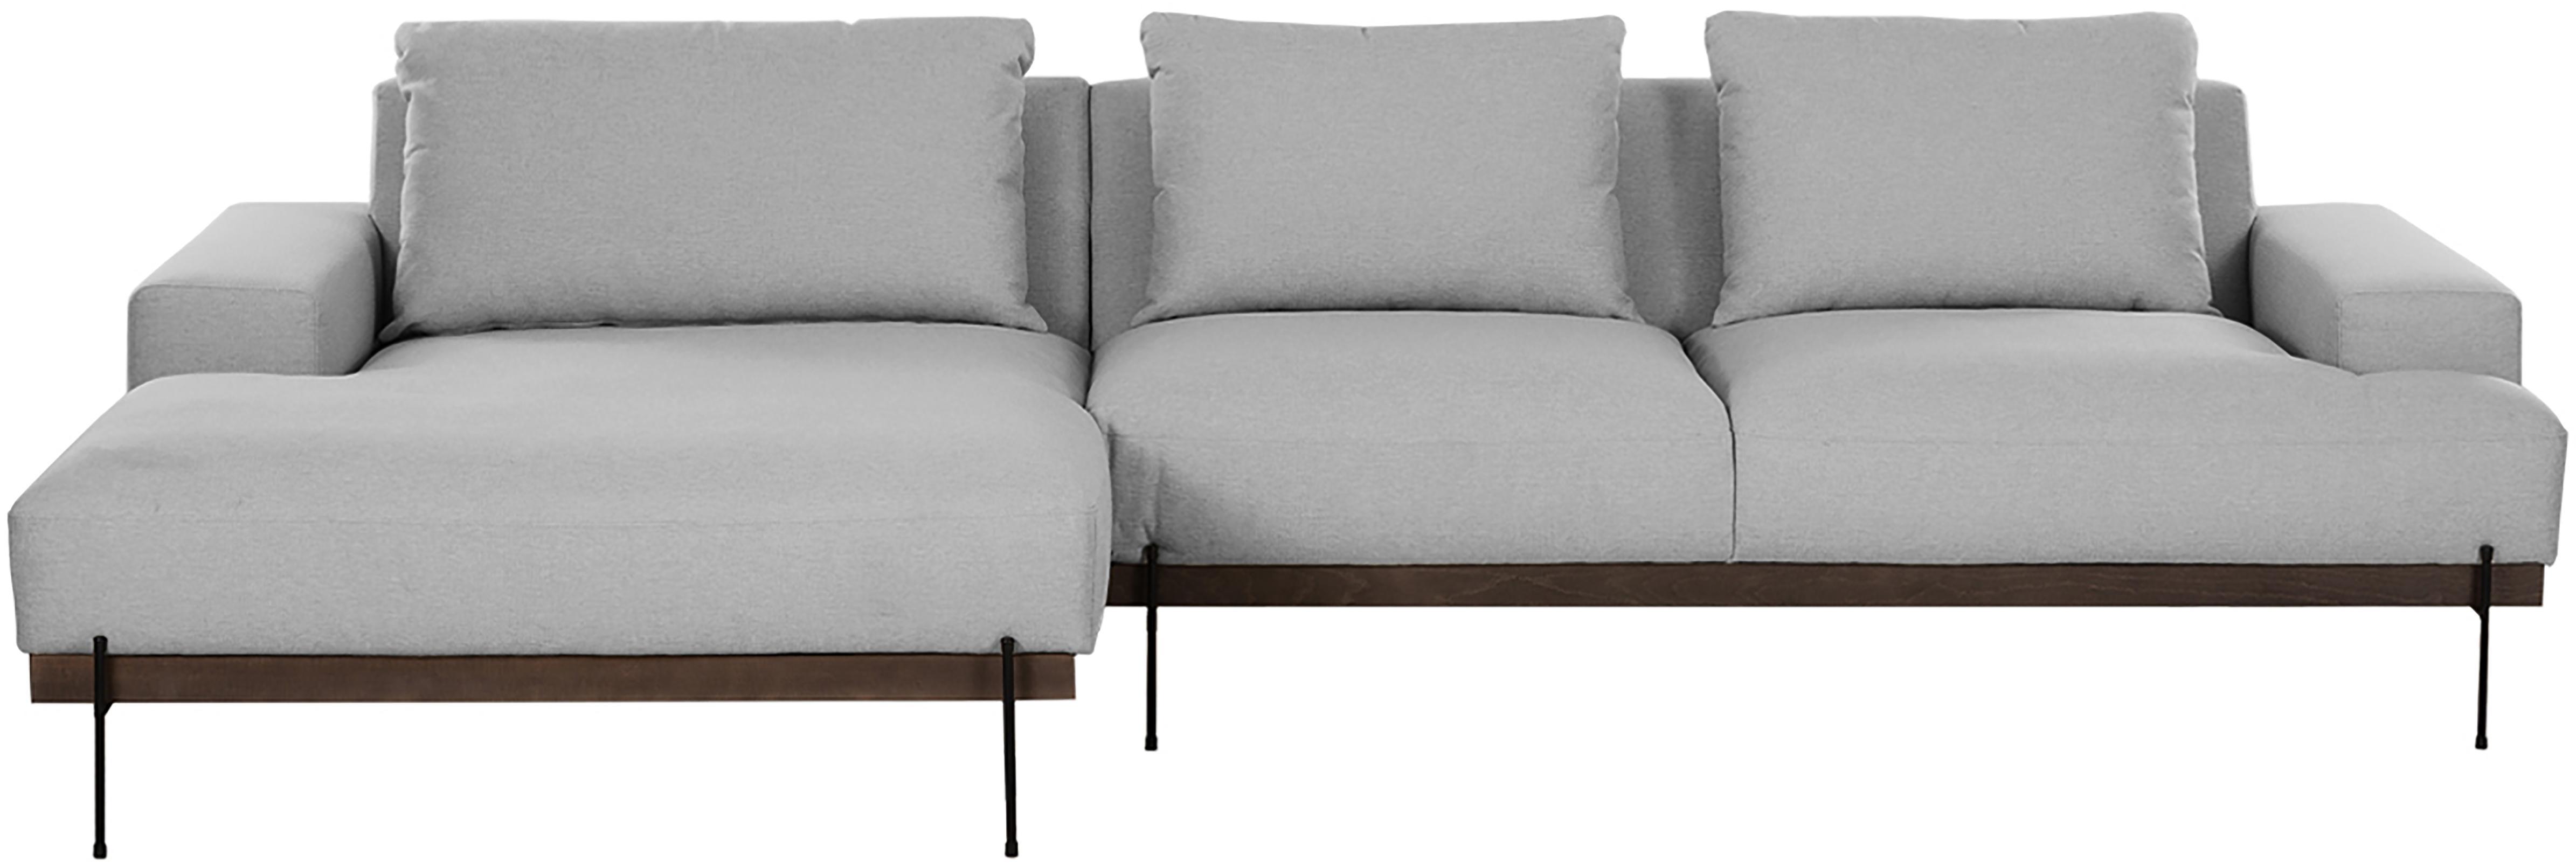 Ecksofa Brooks, Bezug: Polyester 35.000 Scheuert, Gestell: Kiefernholz, massiv, Rahmen: Kiefernholz, lackiert, Webstoff Grau, B 315 x T 148 cm